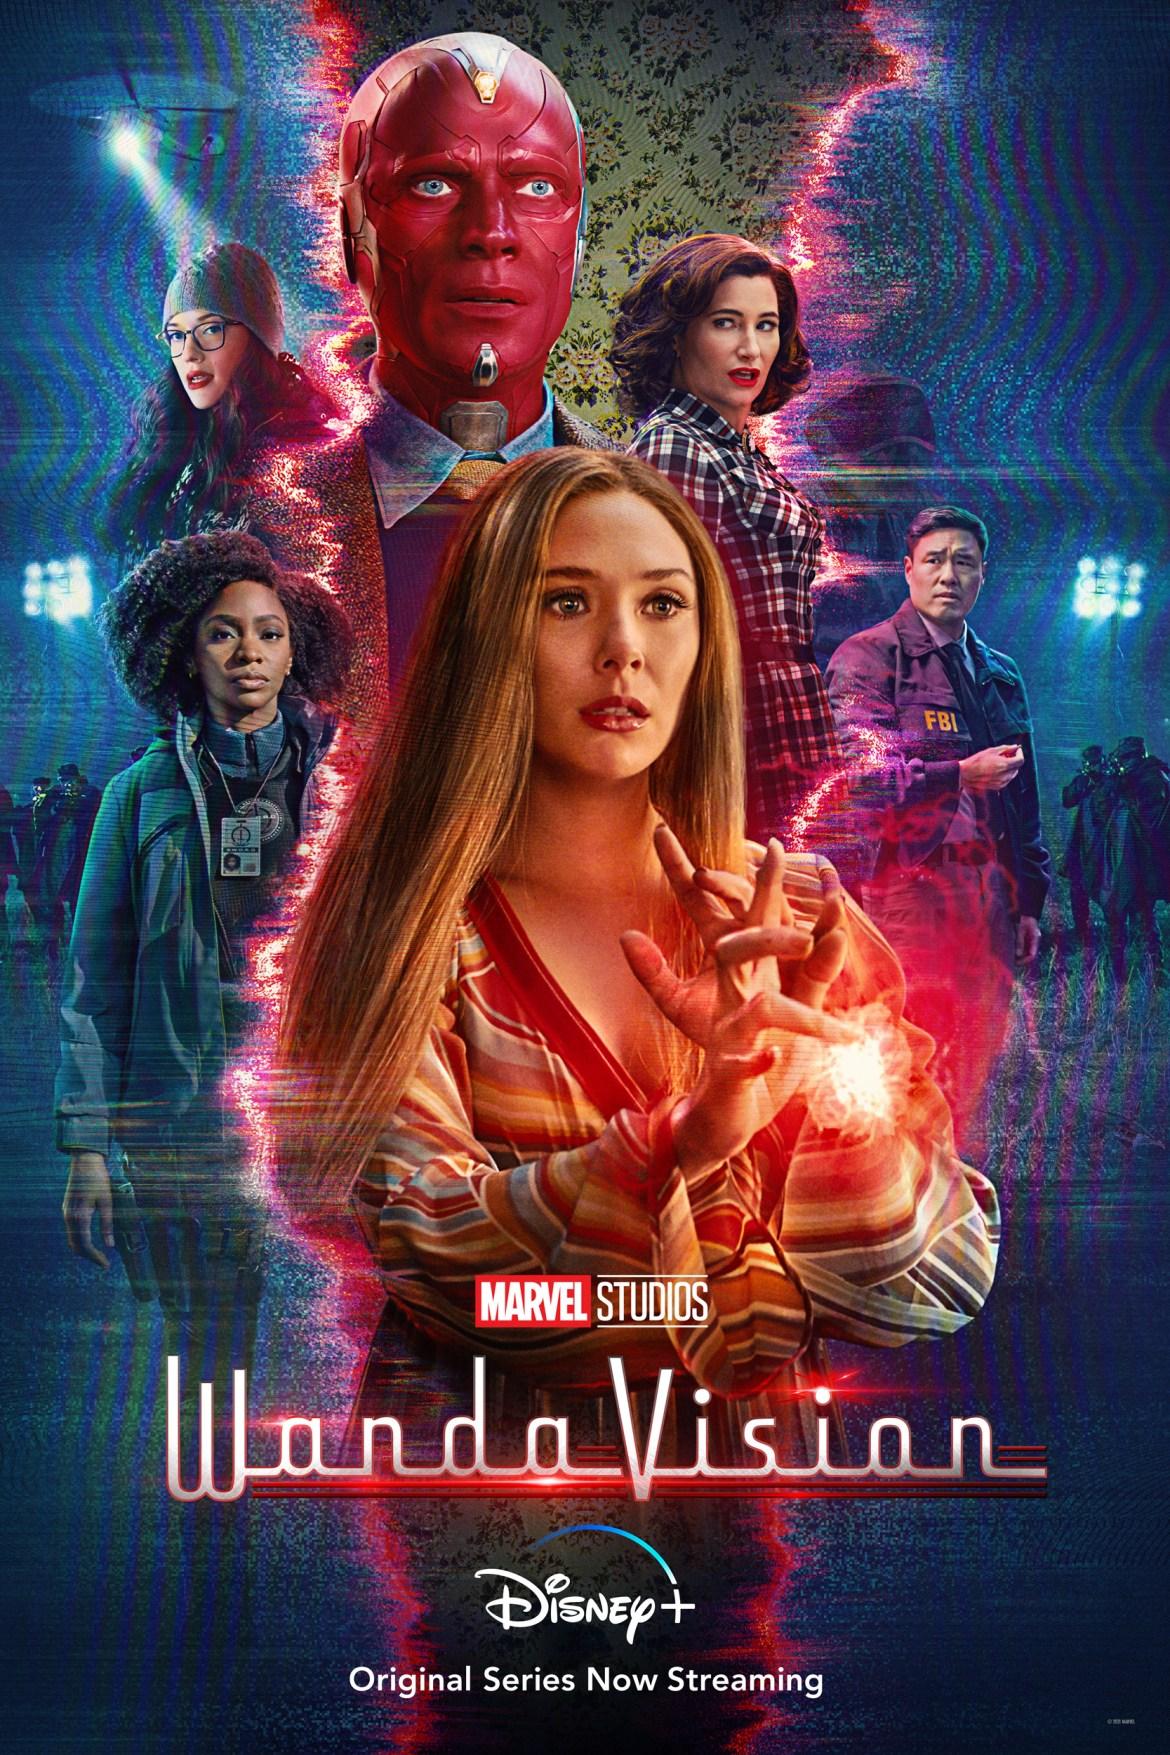 Marvel Studios WandaVision mid-season poster